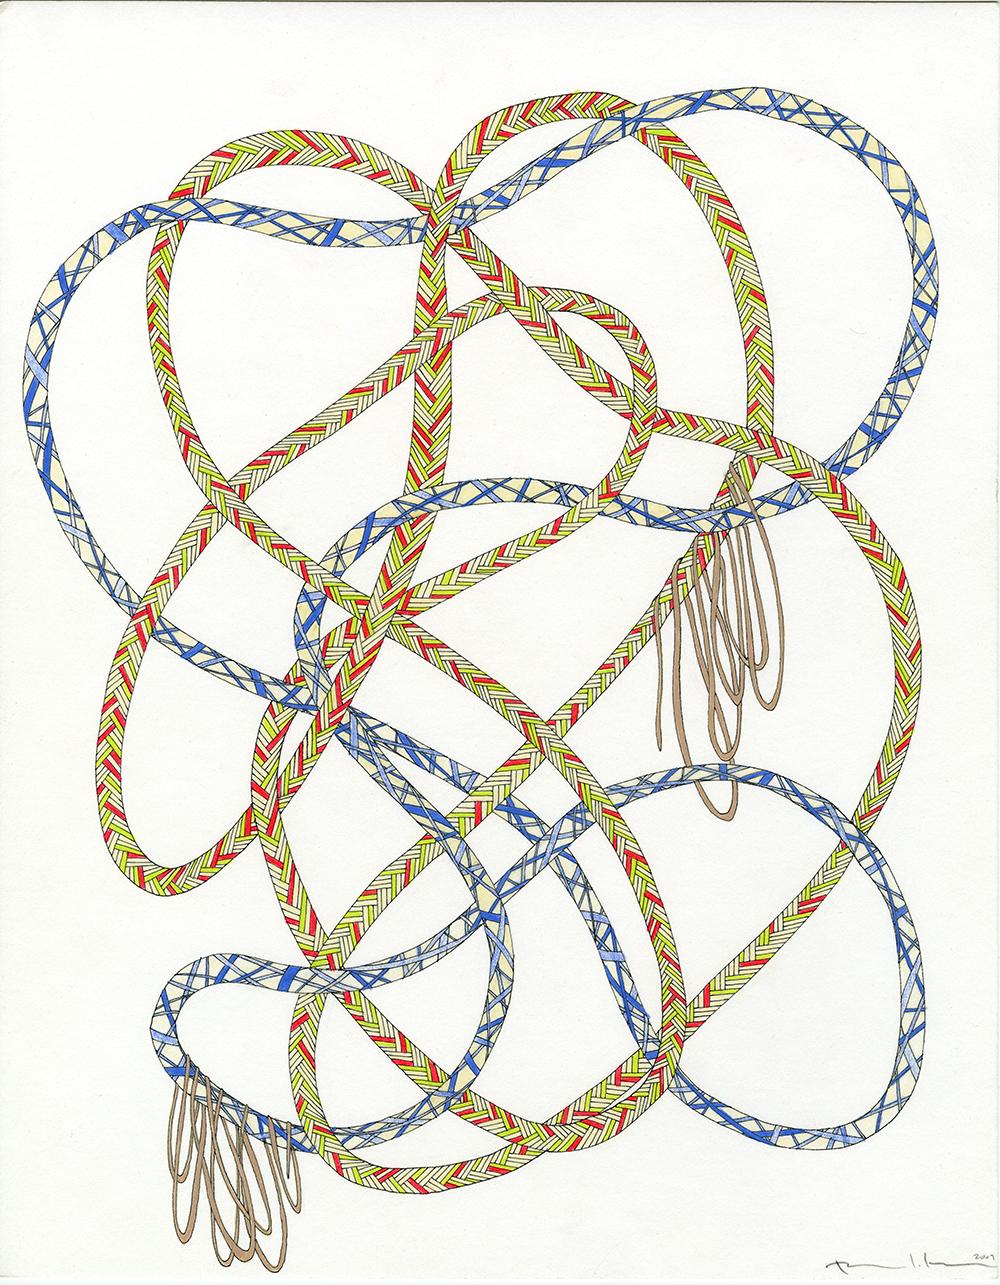 Ropes in Neons, Blue, & Tan_11x14_2009_CC.jpg